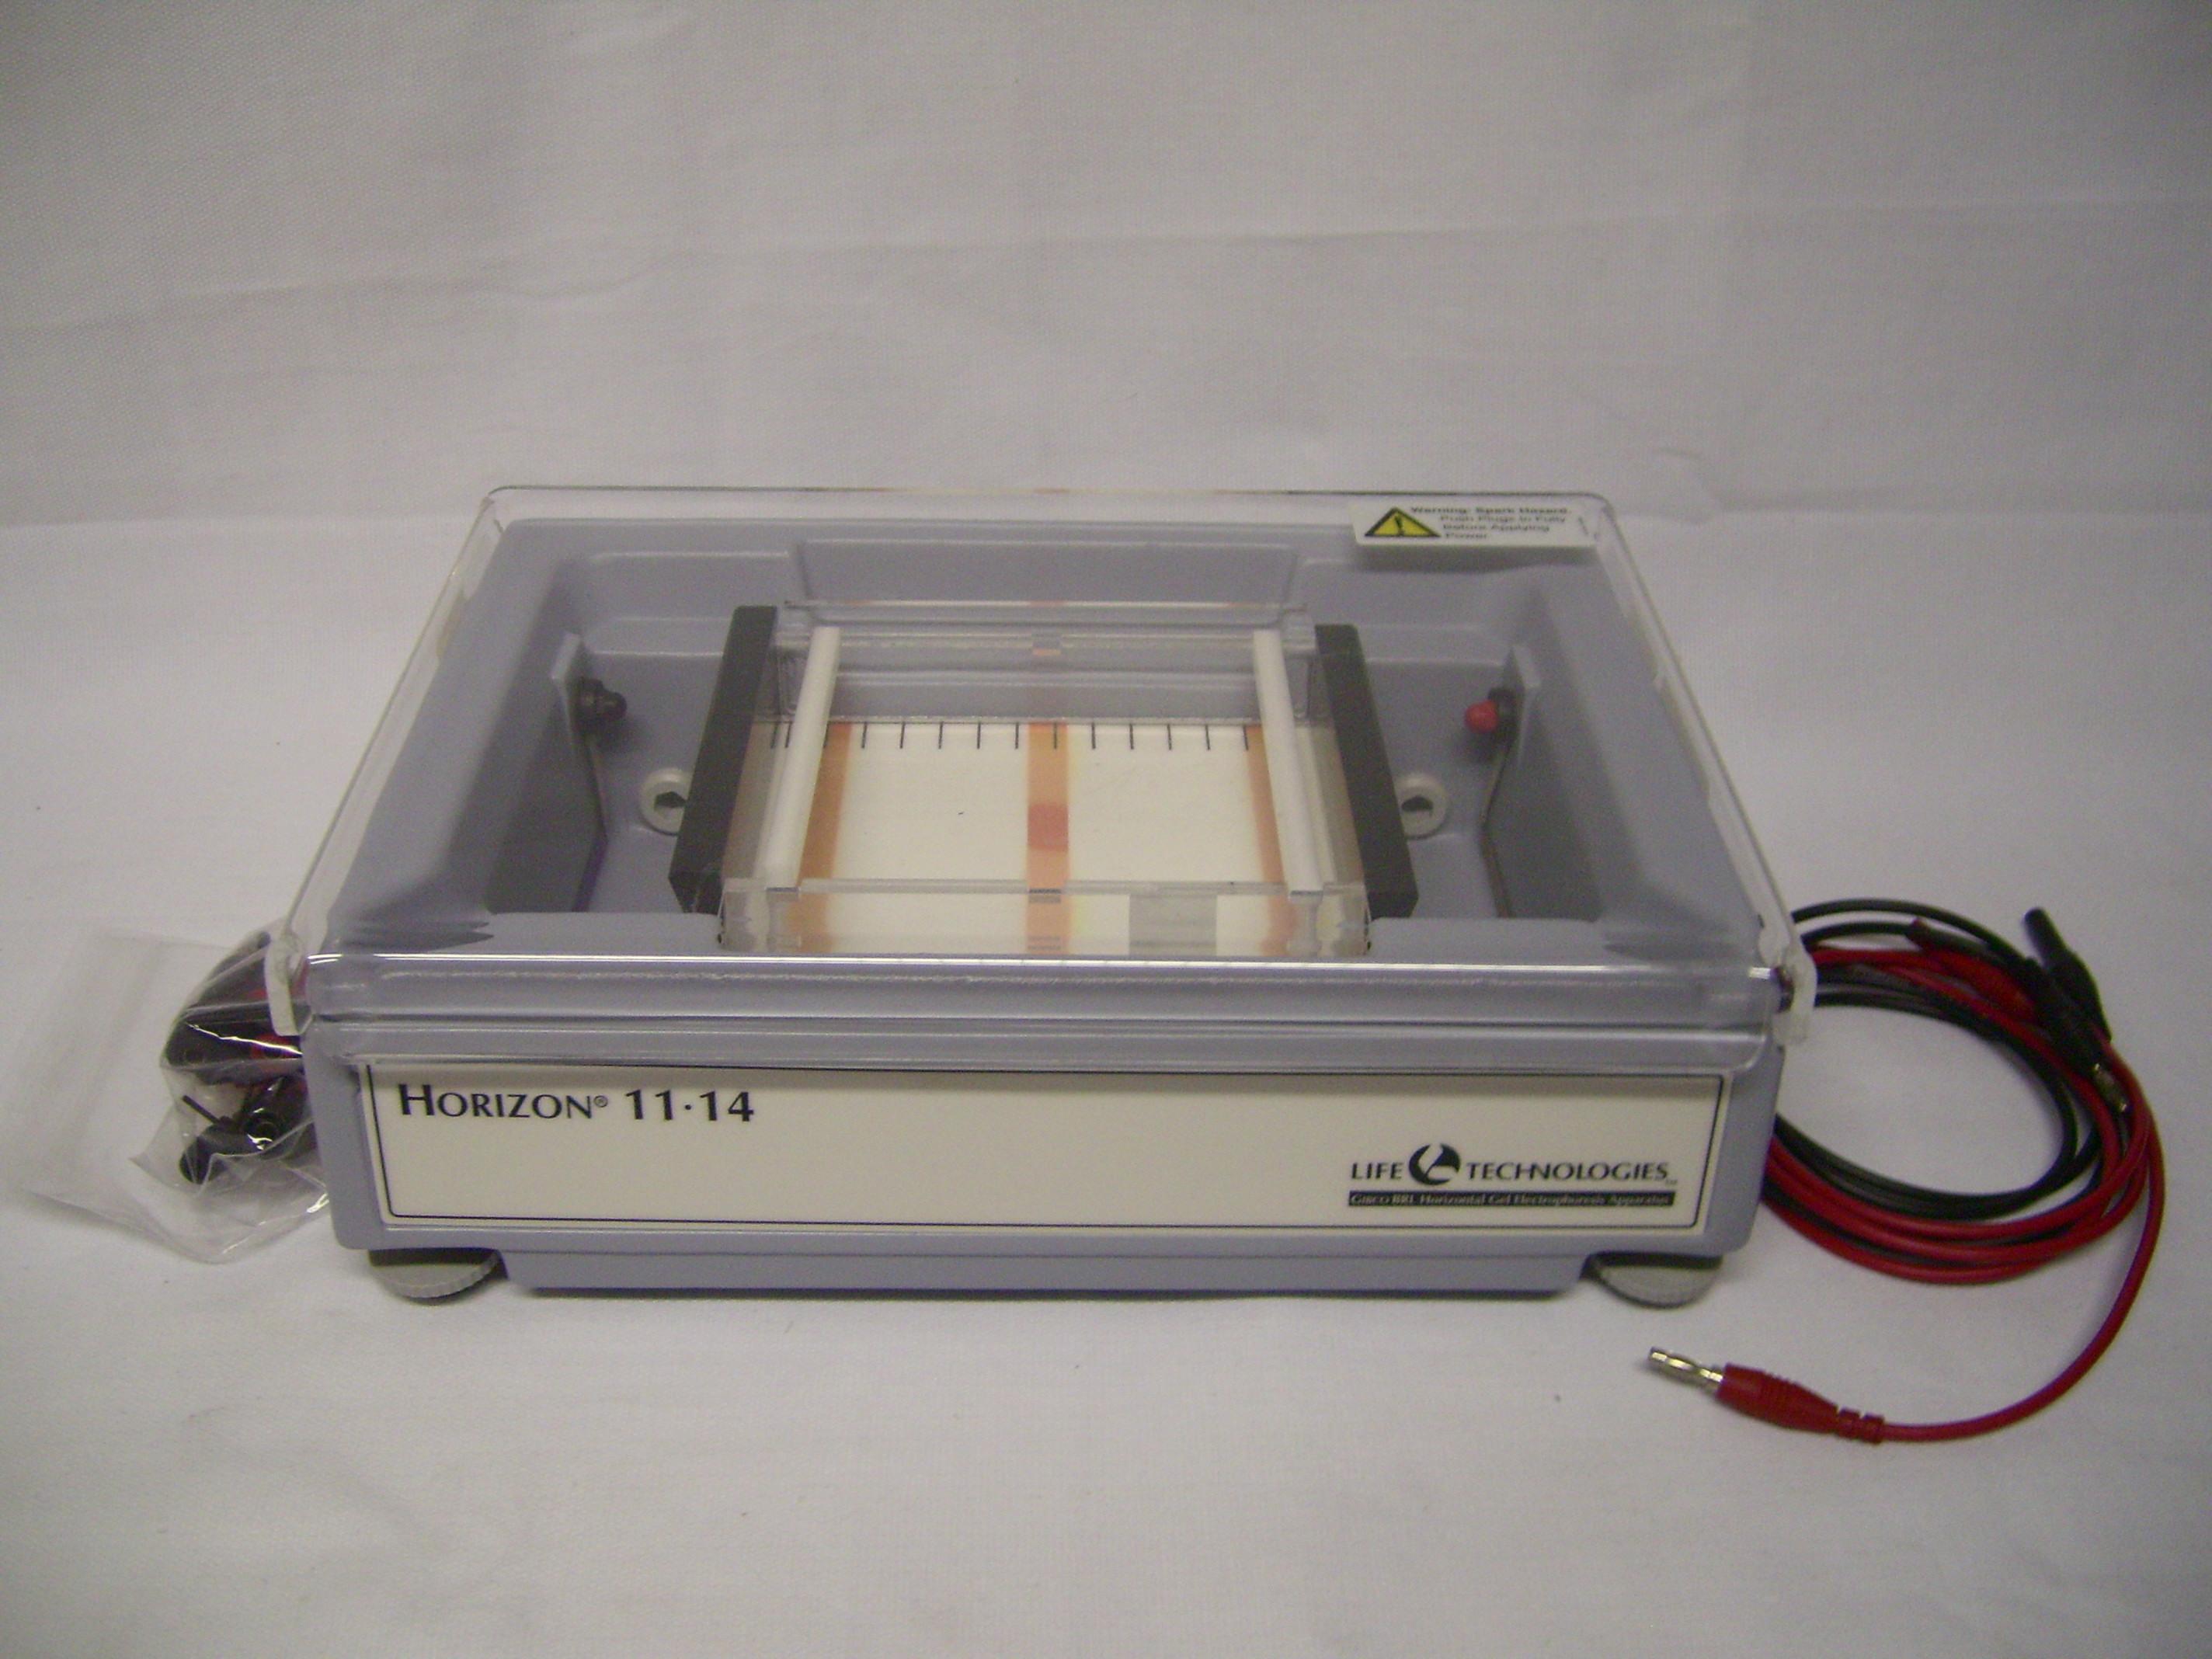 used electrophoresis equipment